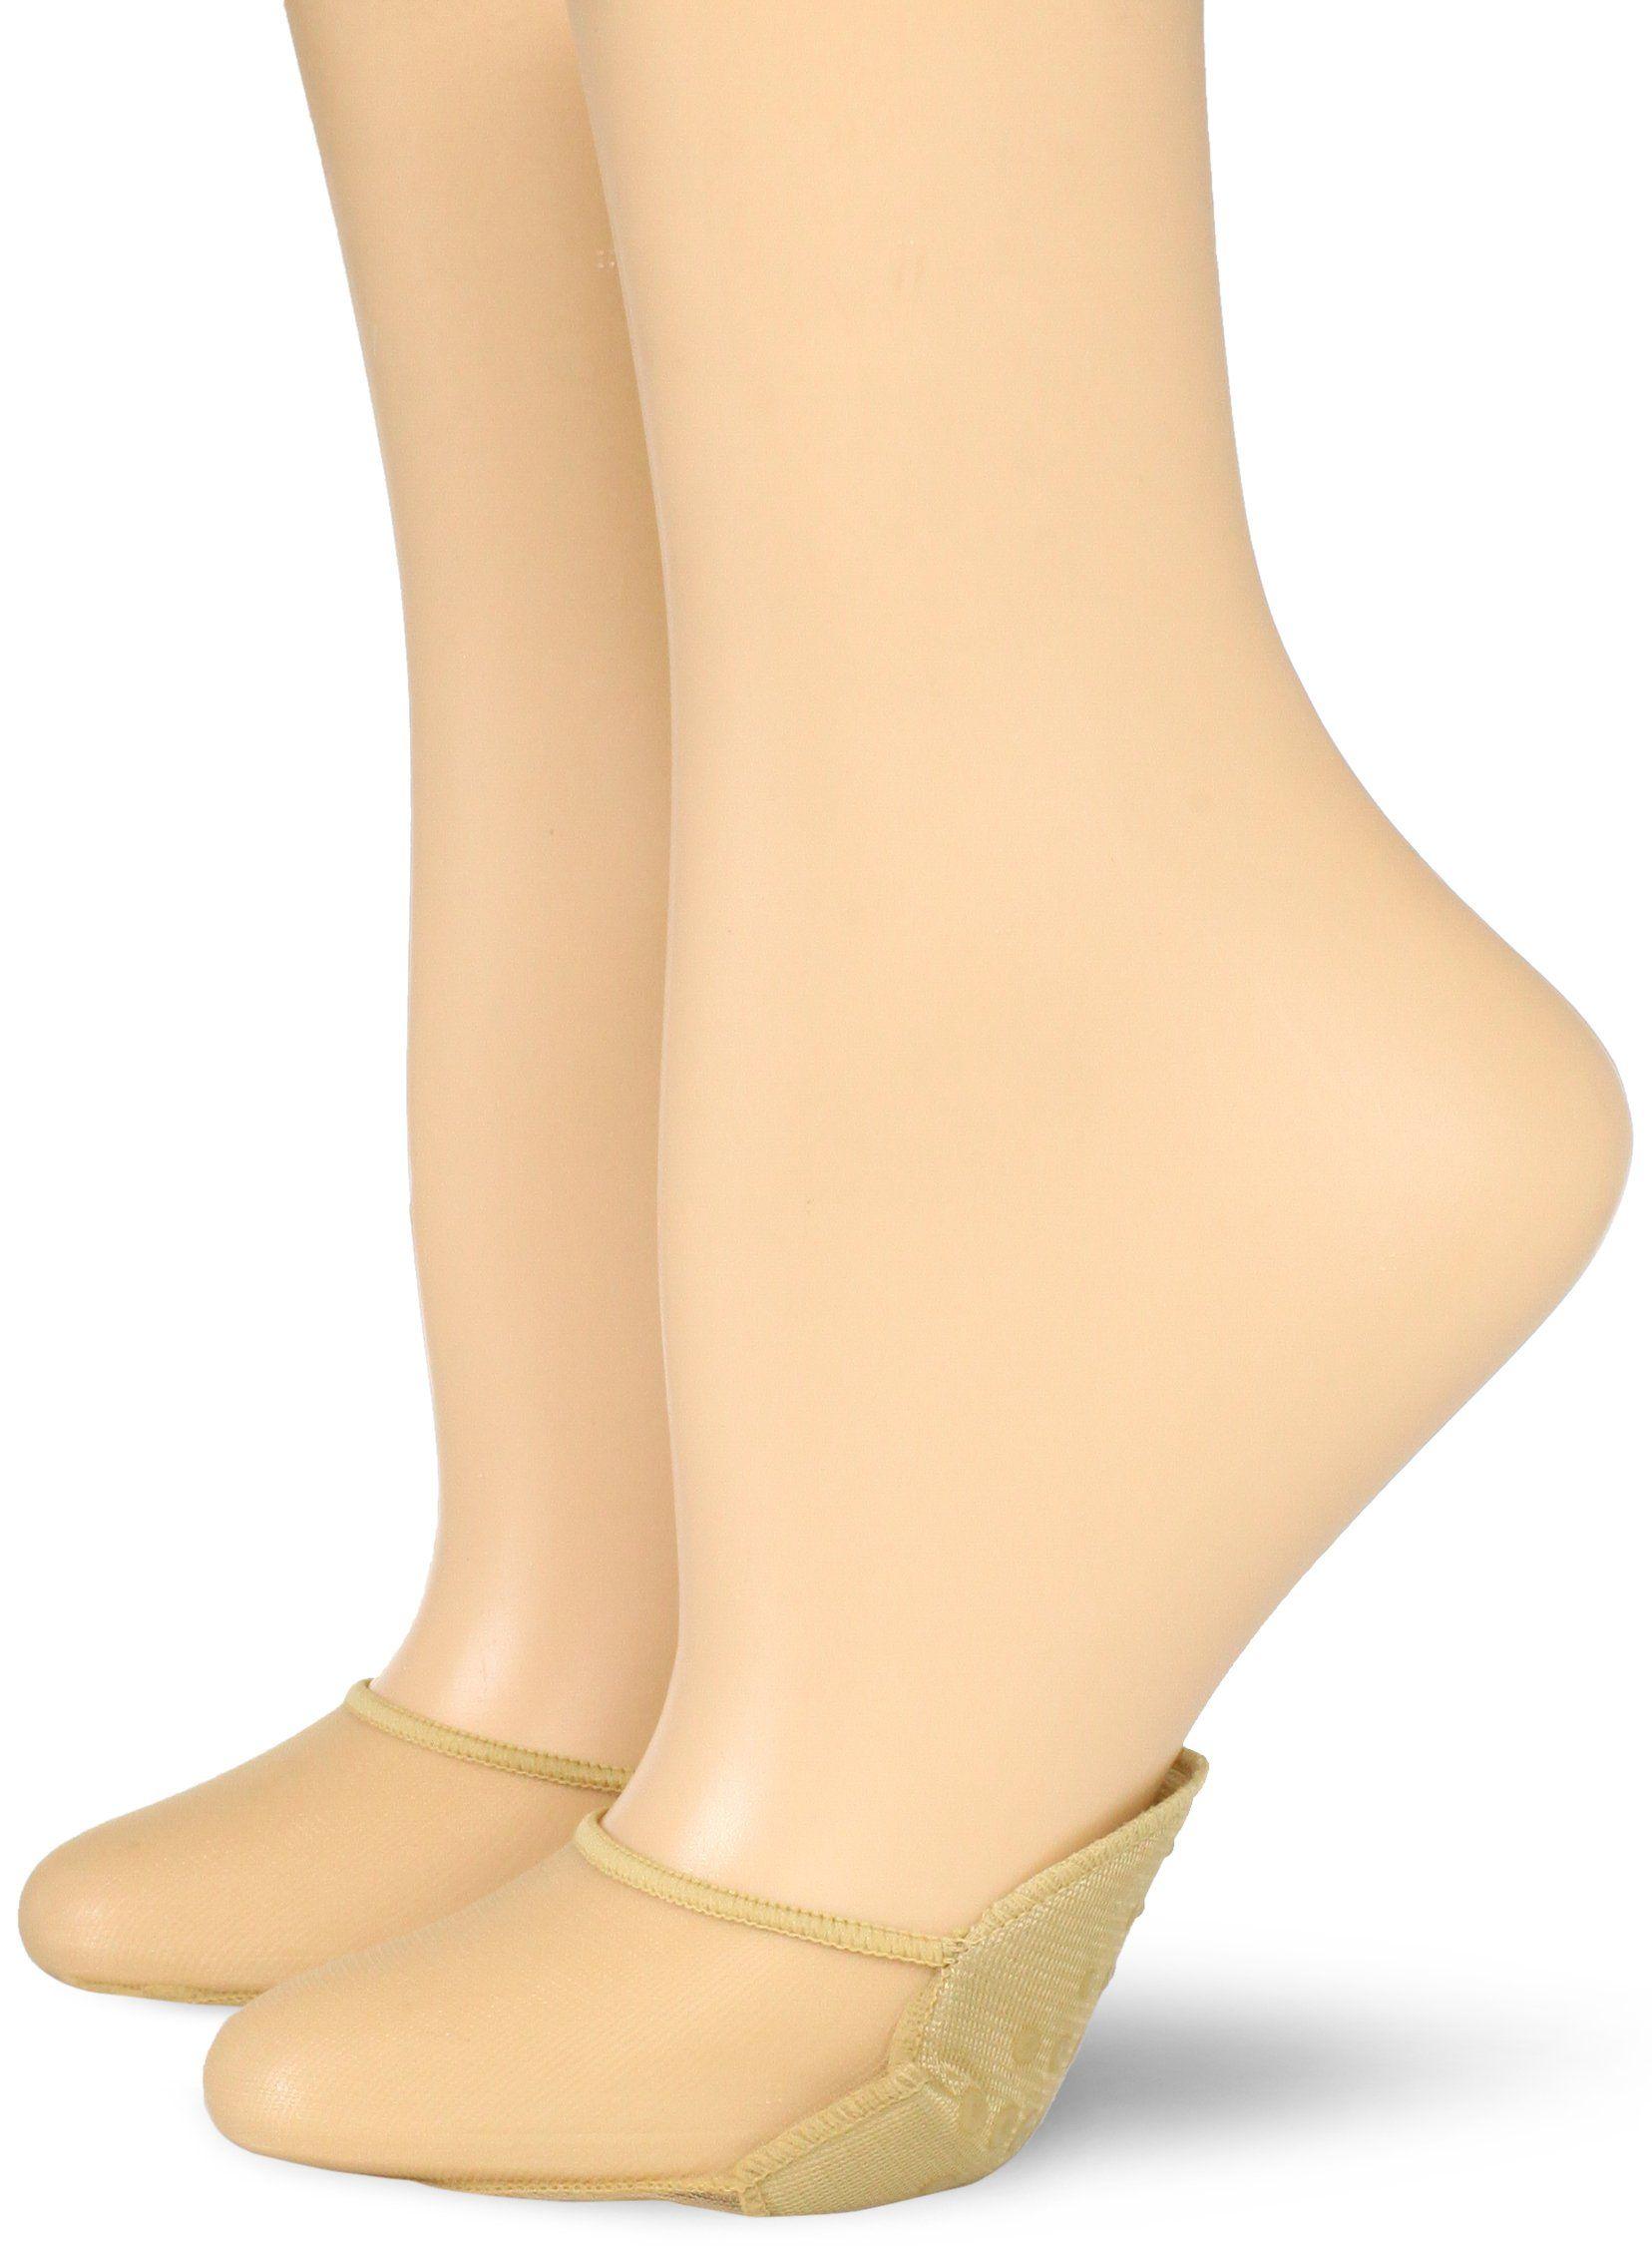 Pack of 24 No Nonsense Nylon Nude Sheer Liner Shoe Socks